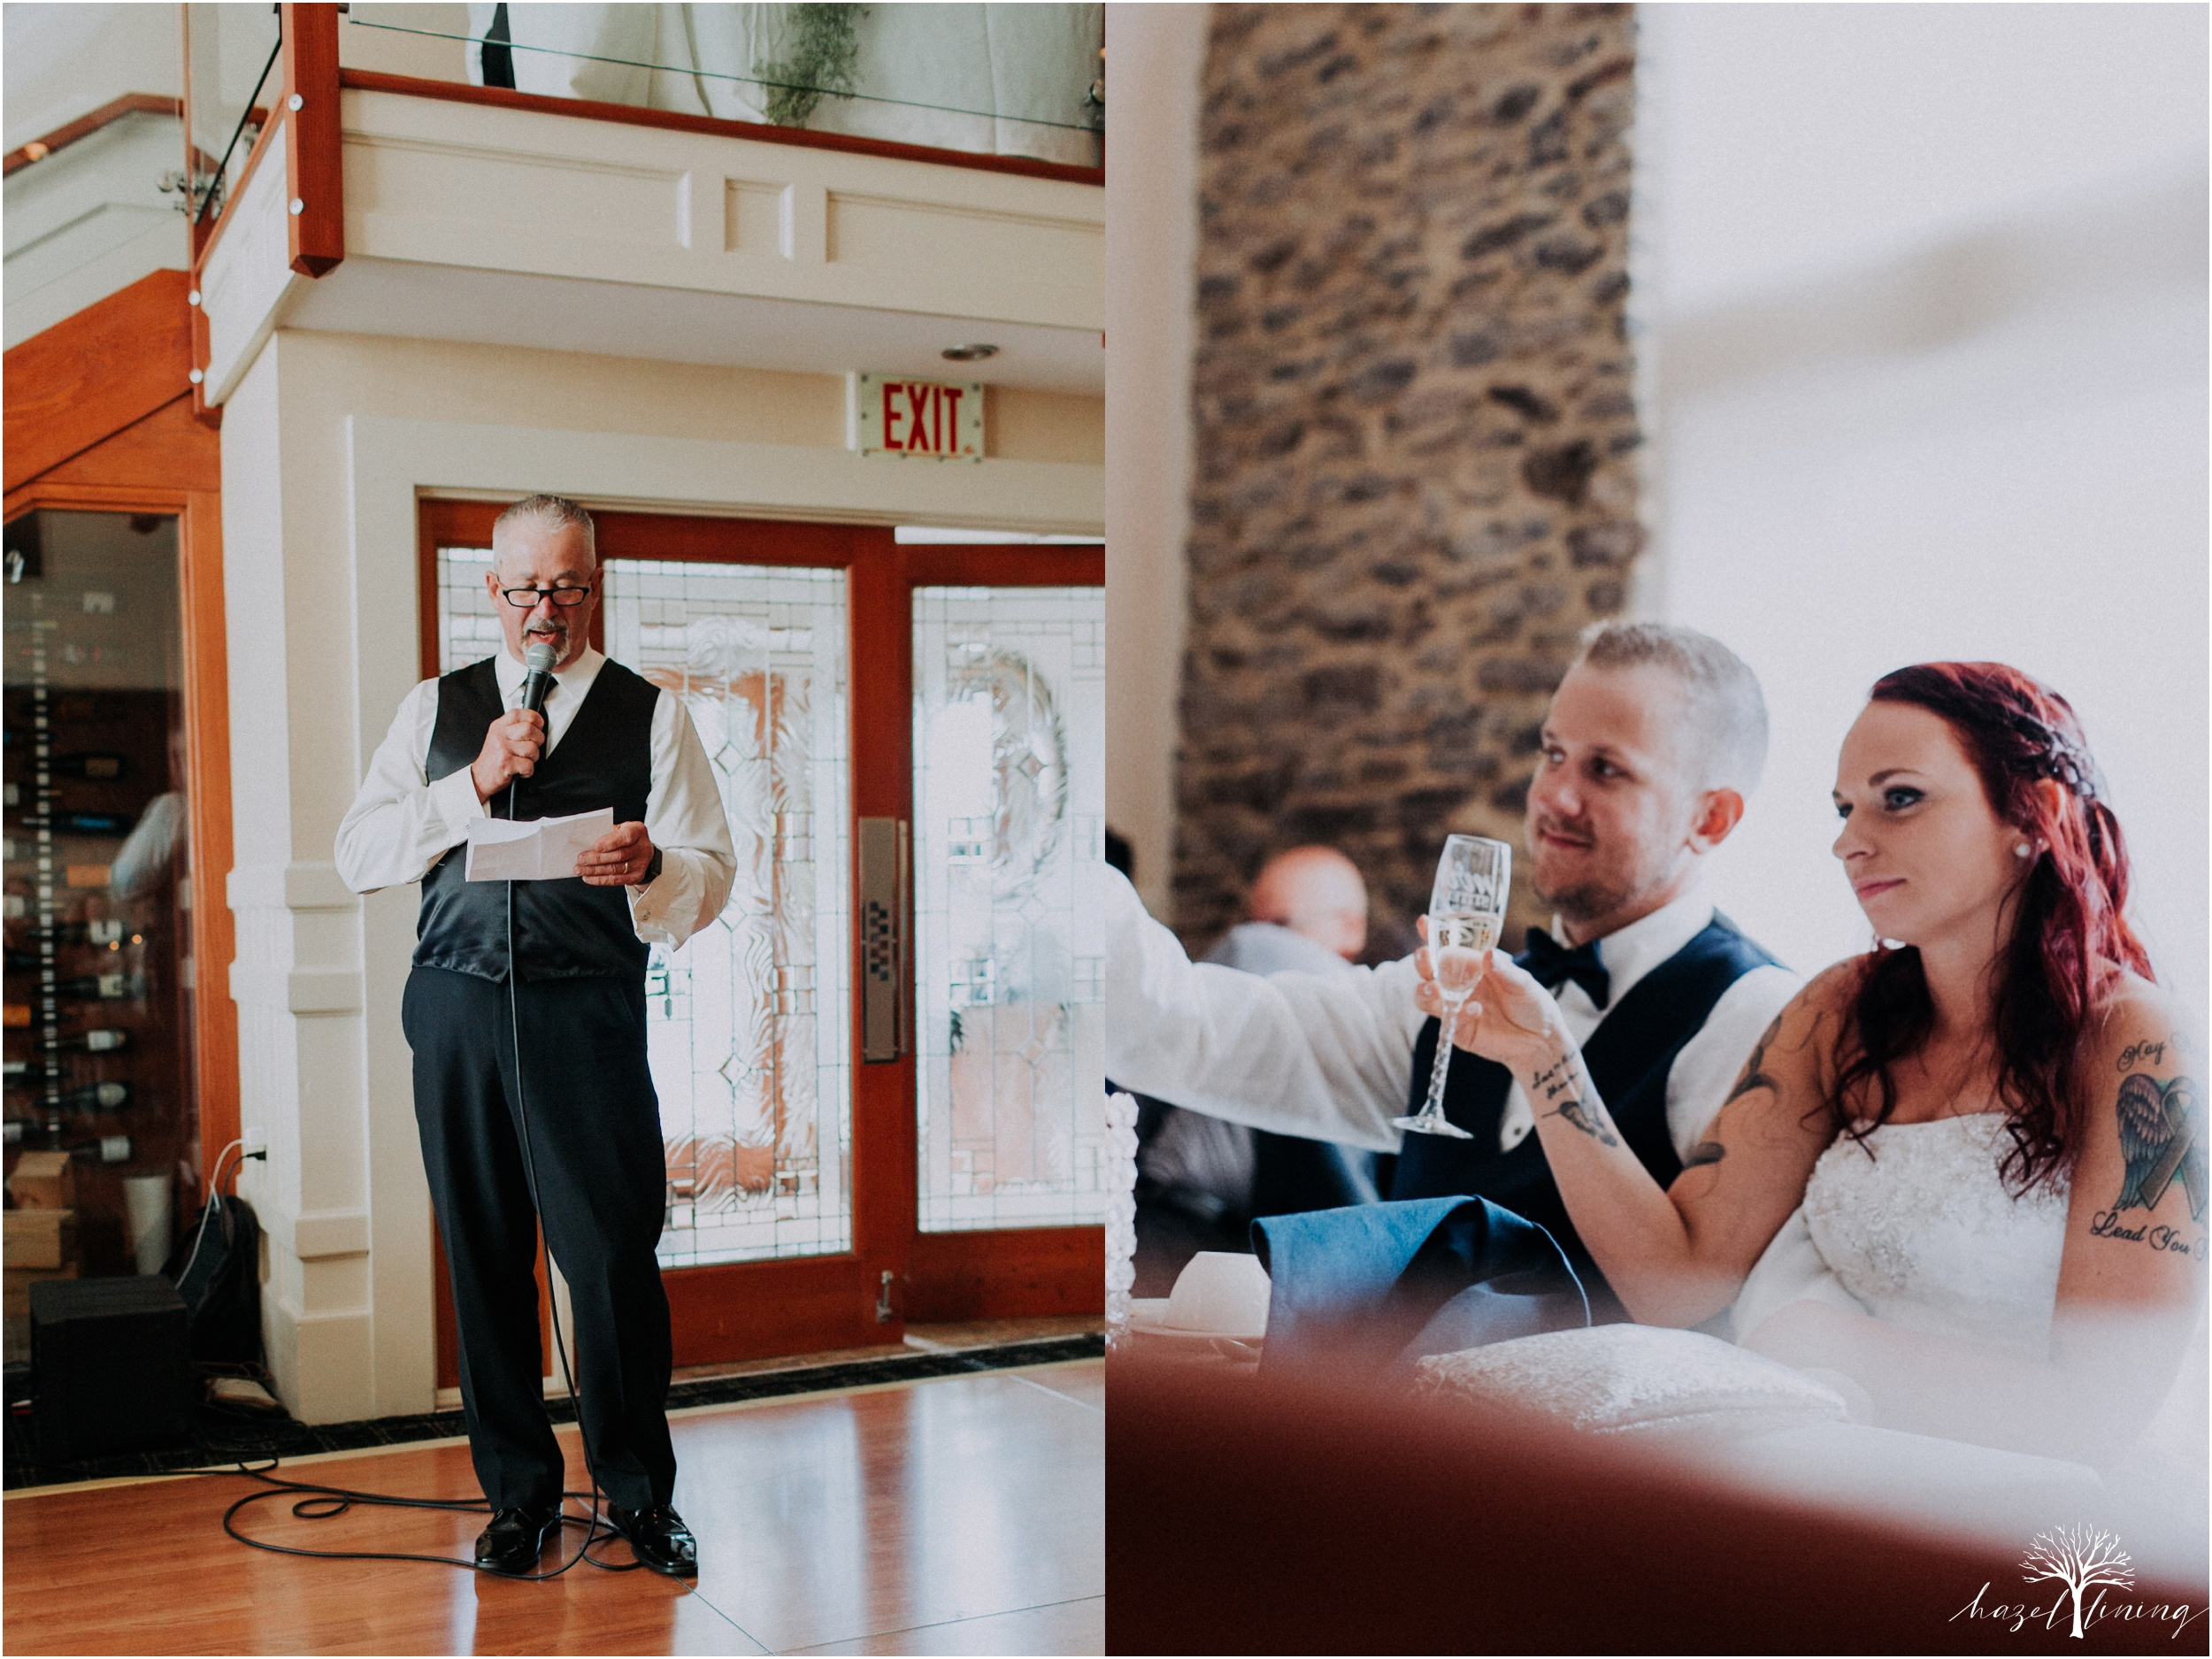 alyssa-james-stiteler-wedding-loft-and-sweet-water-cc-pennsburg-pennsylvania-hazel-lining-travel-wedding-elopement-photography_0121.jpg